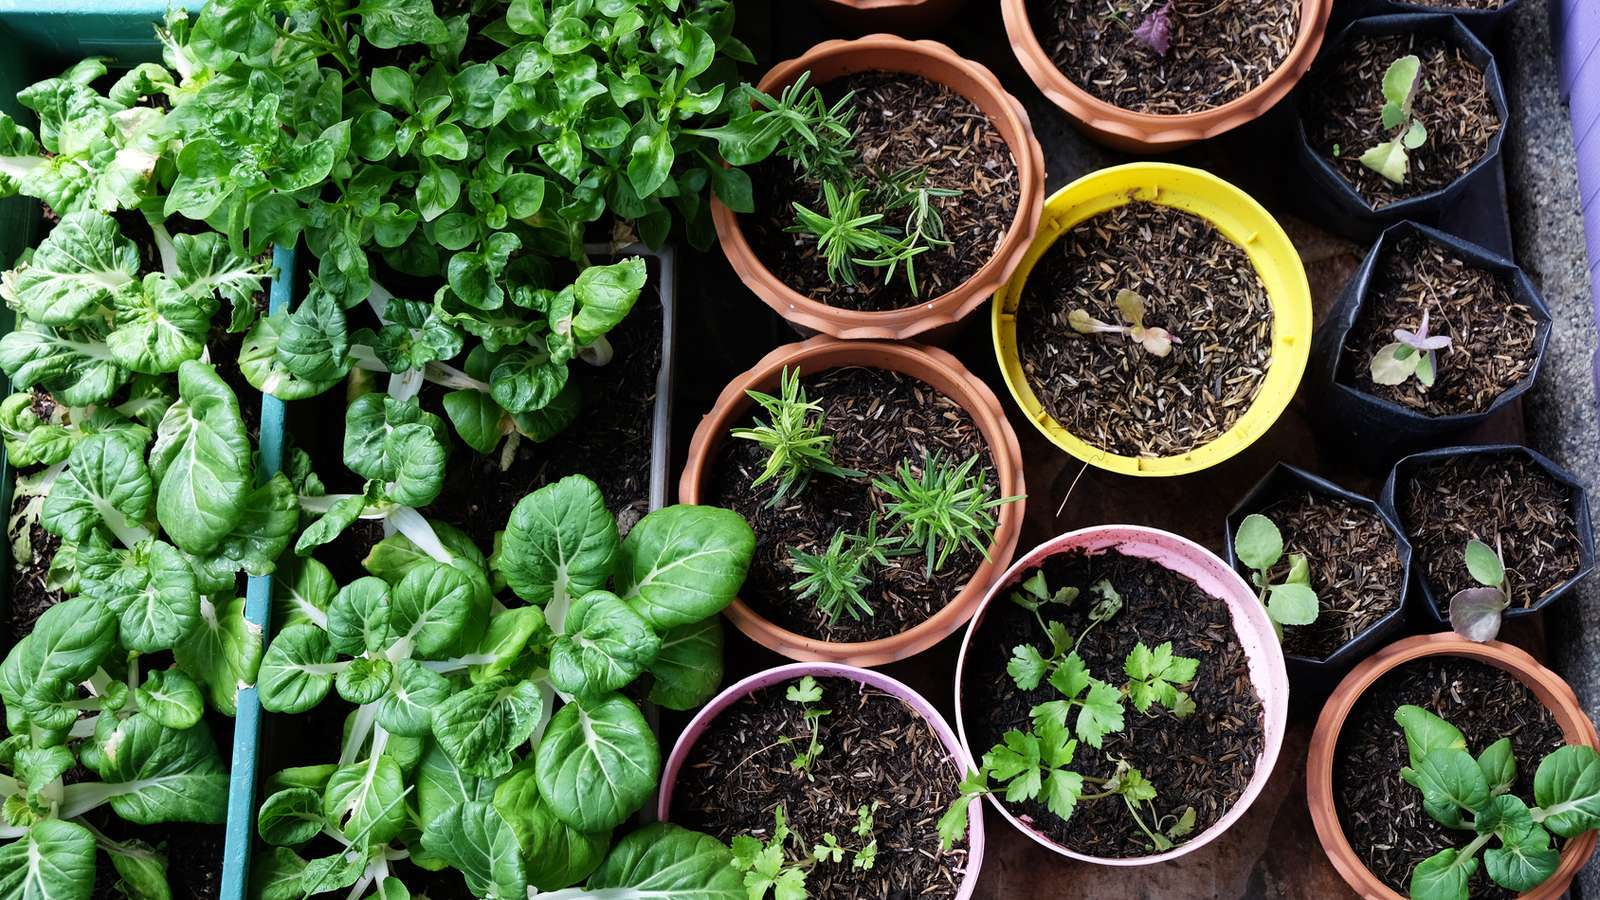 Full Size of Various Organic Vegetables Garden In House Area. Küche Kräutergarten Küche